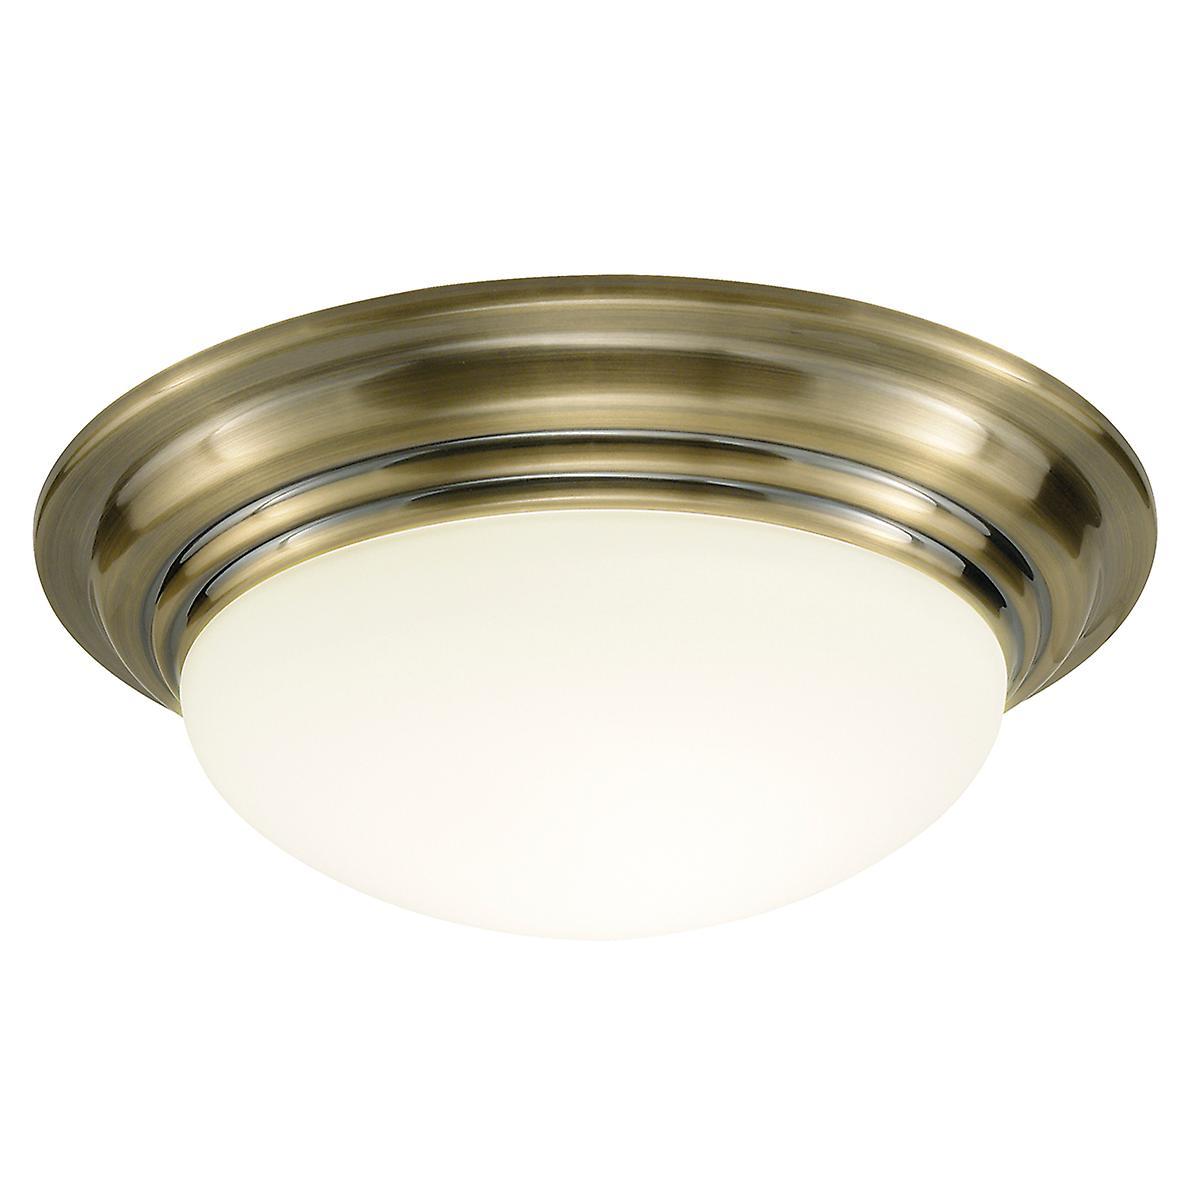 Dar BAR5075 Barclay Traditional Antique Bathroom Flush Ceiling Light - 38cm